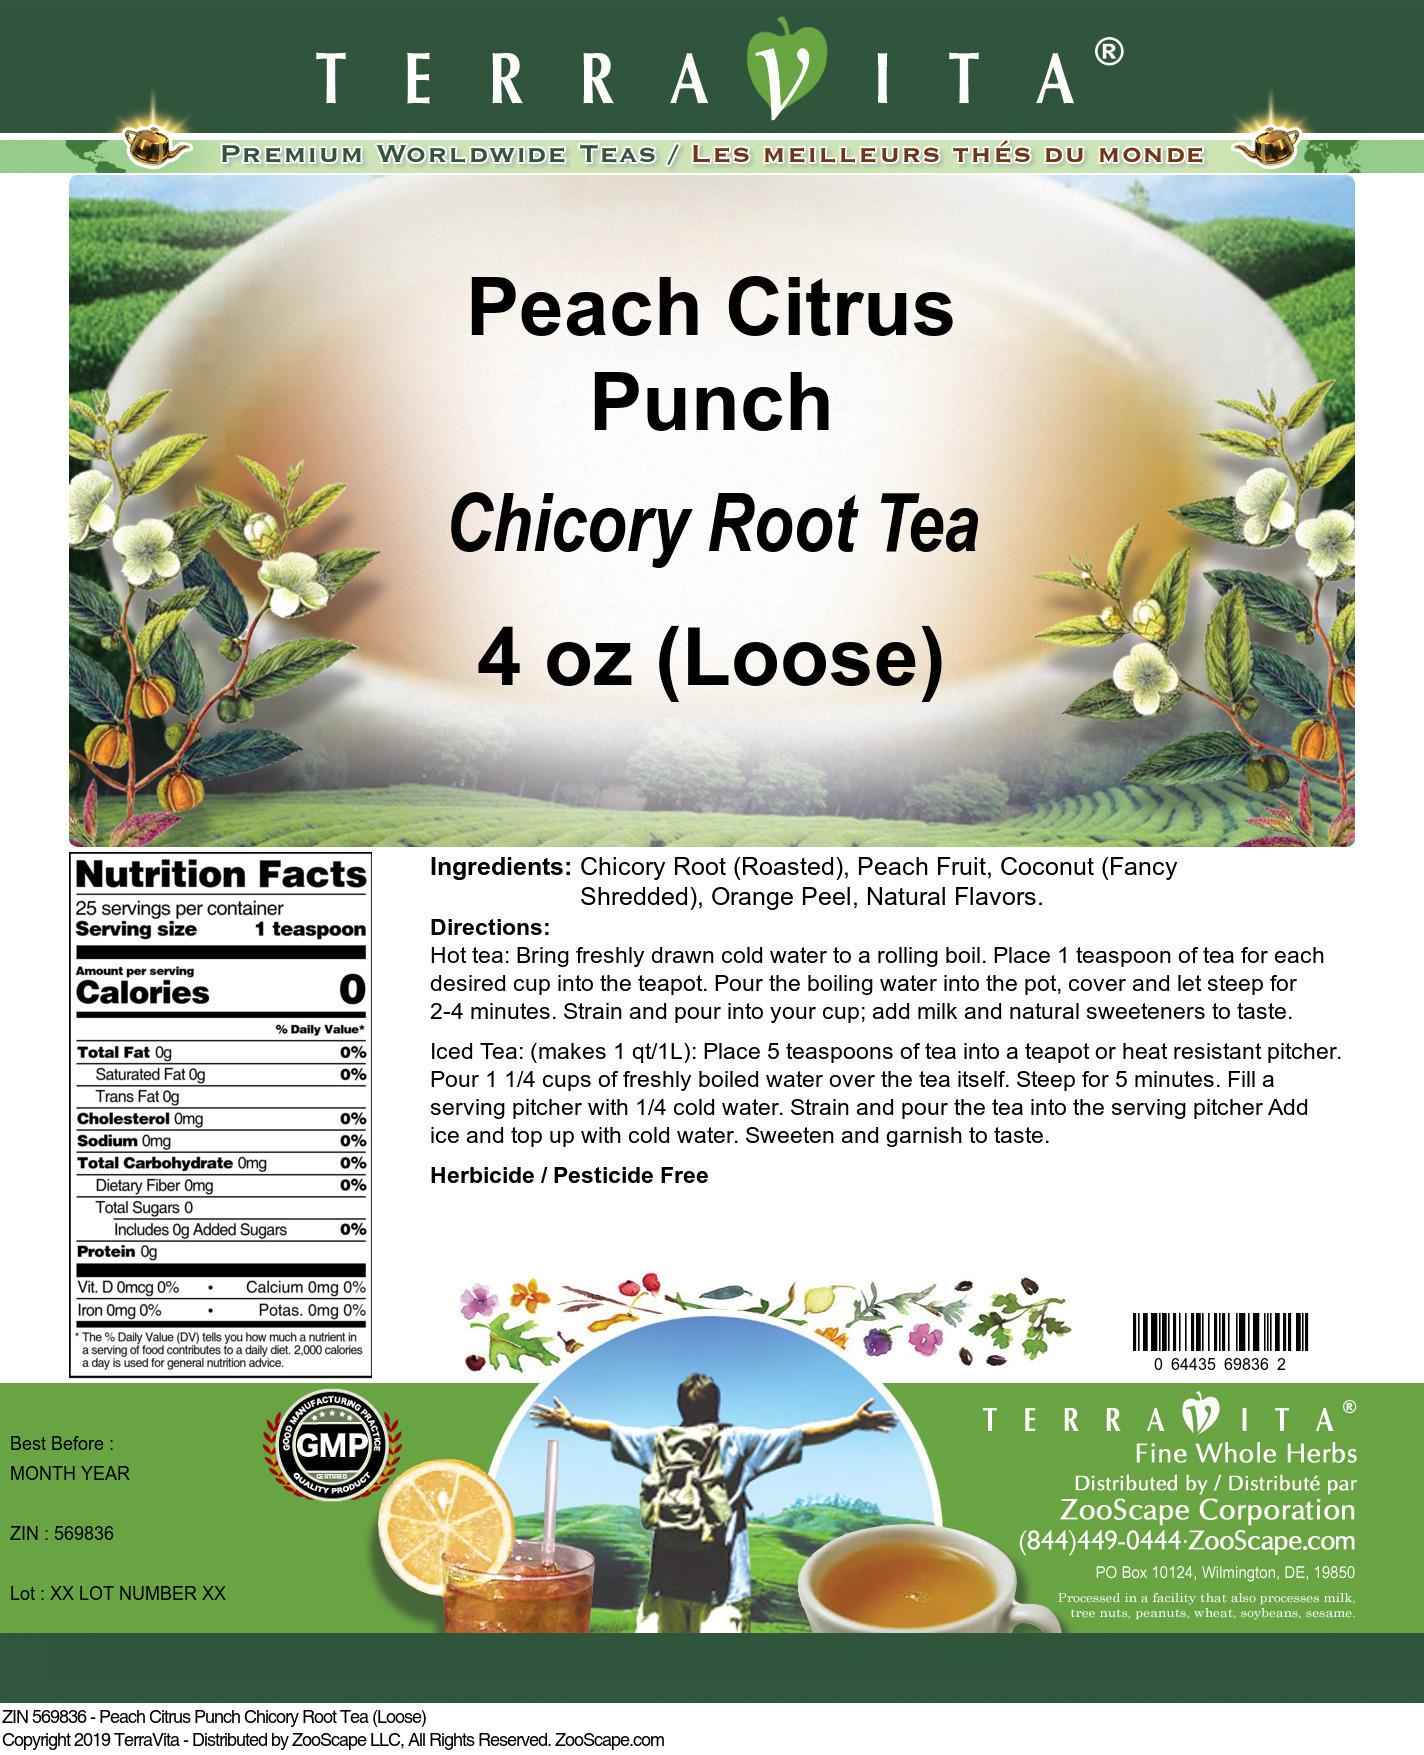 Peach Citrus Punch Chicory Root